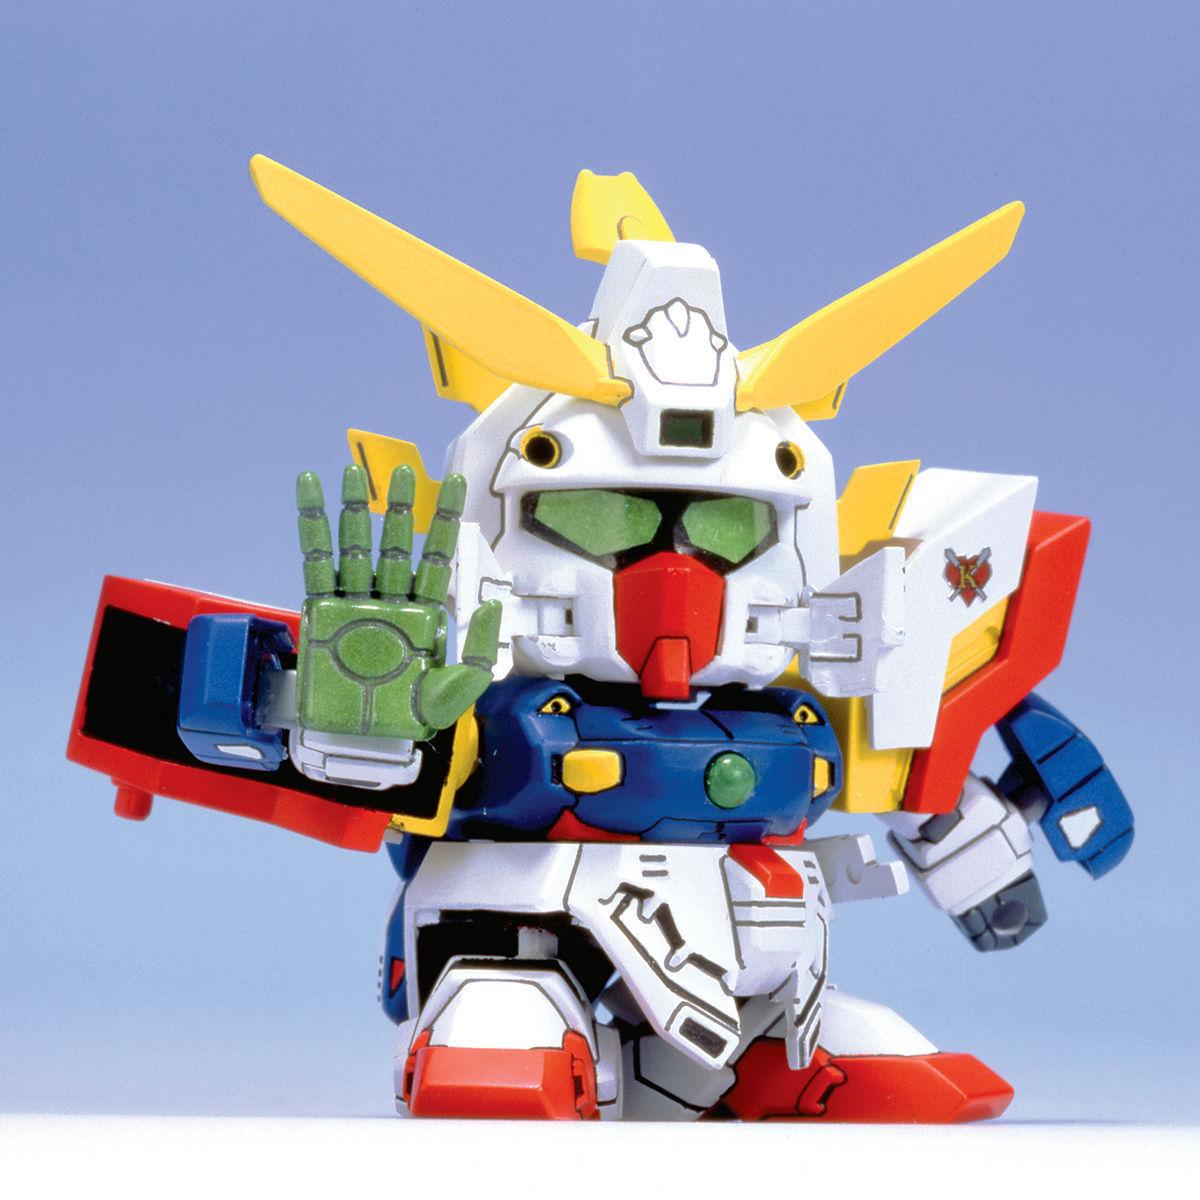 SDガンダム GジェネレーションZERO(GGENERATION-0) 025 GF13-017NJ シャイニングガンダム(シャイニングフィンガーモード) [Shining Gundam (Shining Finger Mode)]